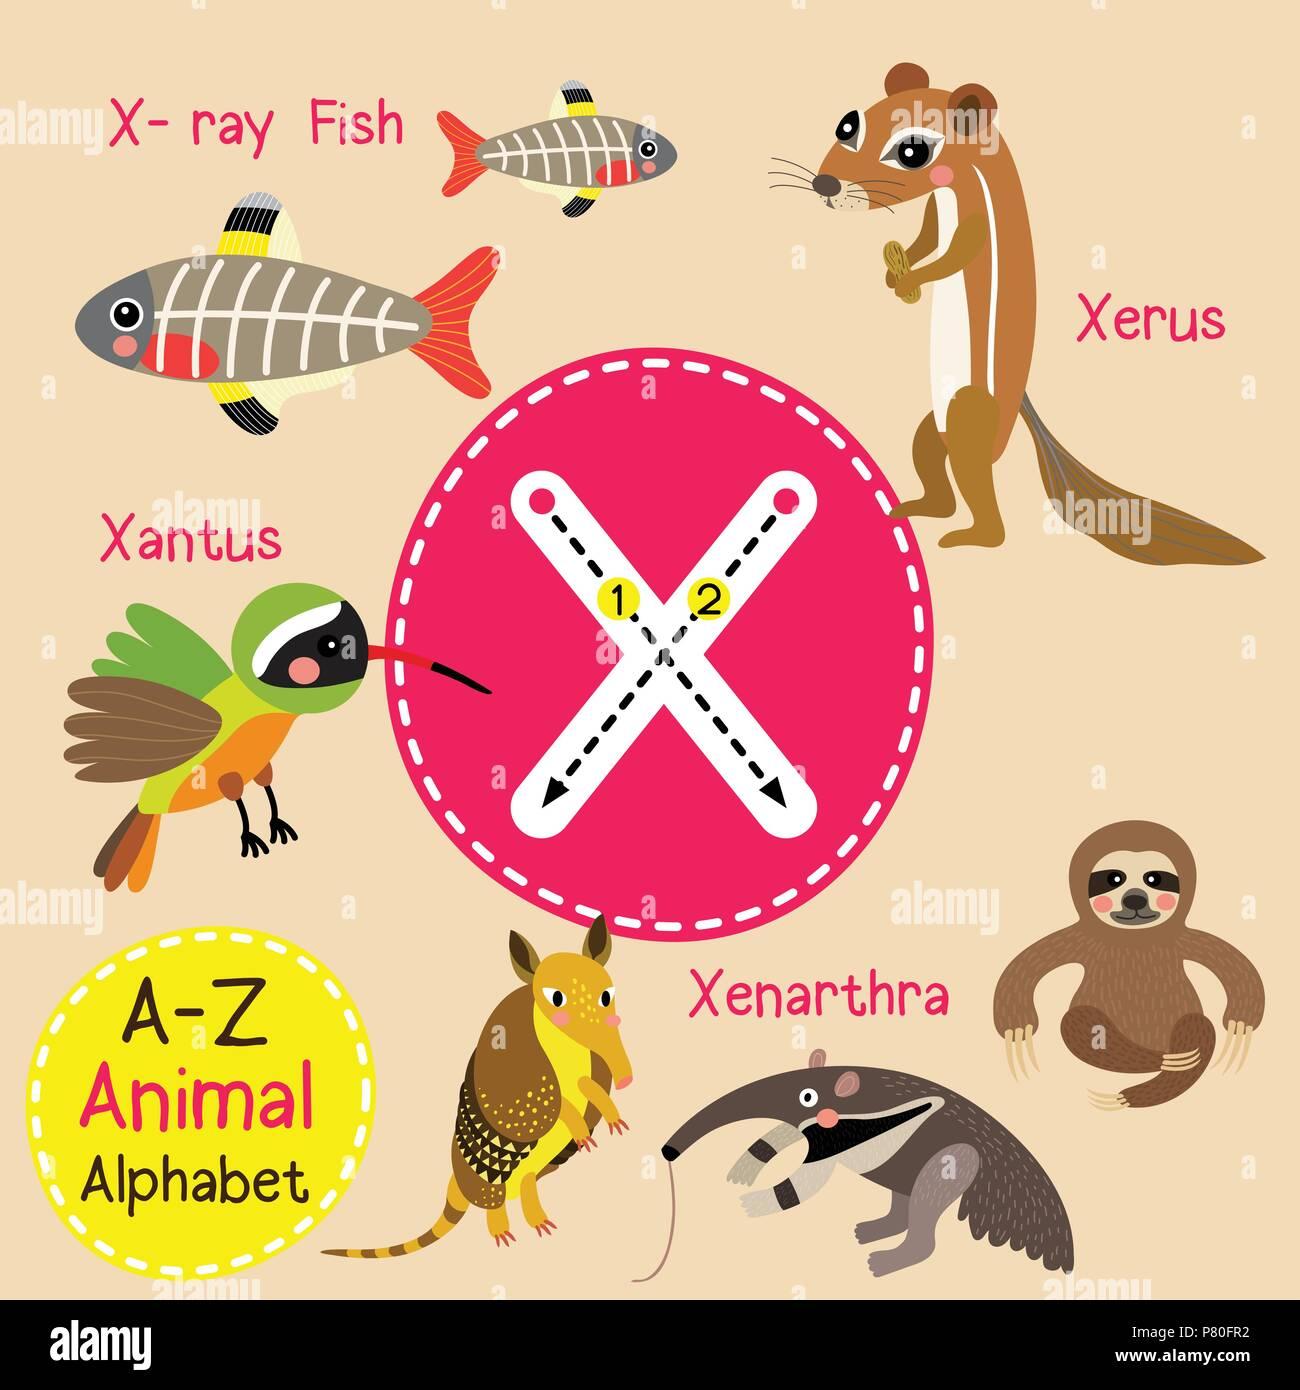 x animal aumenta o tamanho